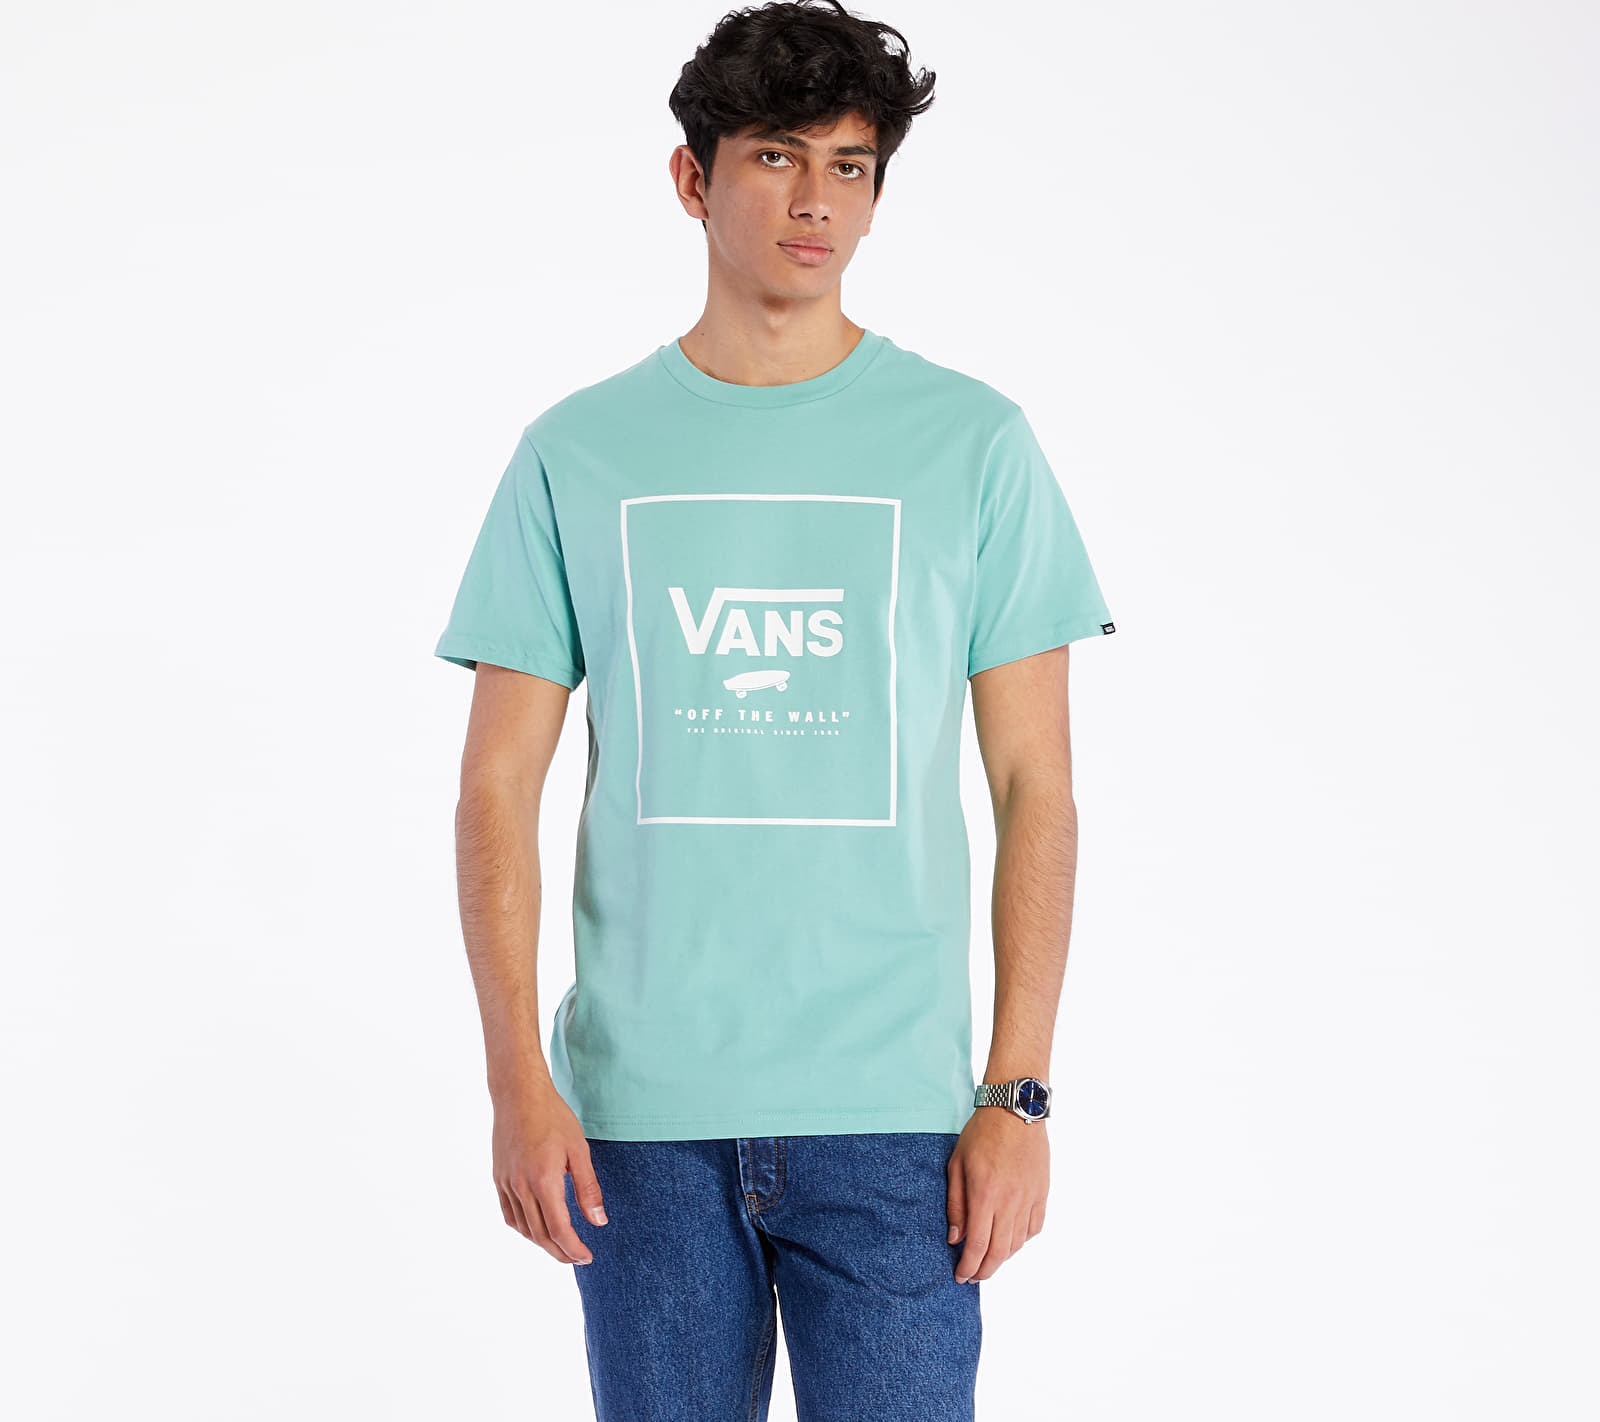 Vans Print Tee Canton/ White